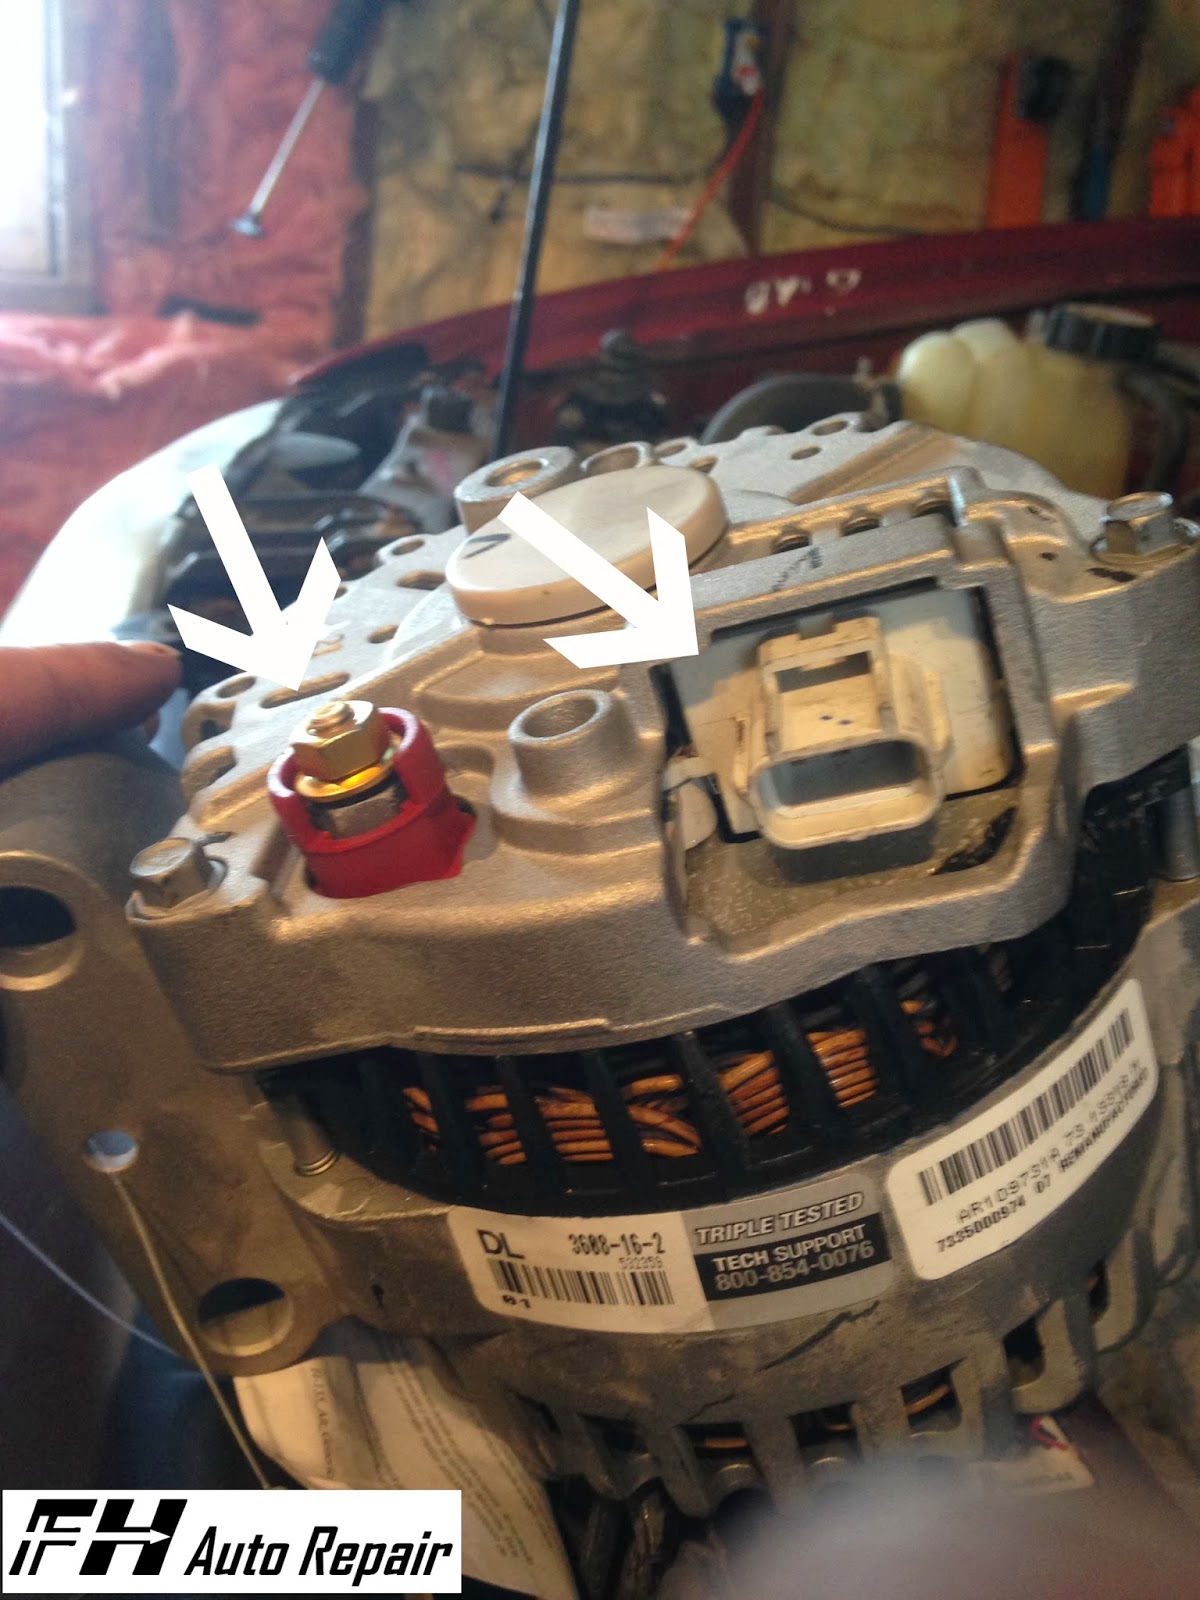 2005 Ford Escape Alternator Wiring Diagram 1997 Volkswagen Jetta Radio Replace V6 Autos Post